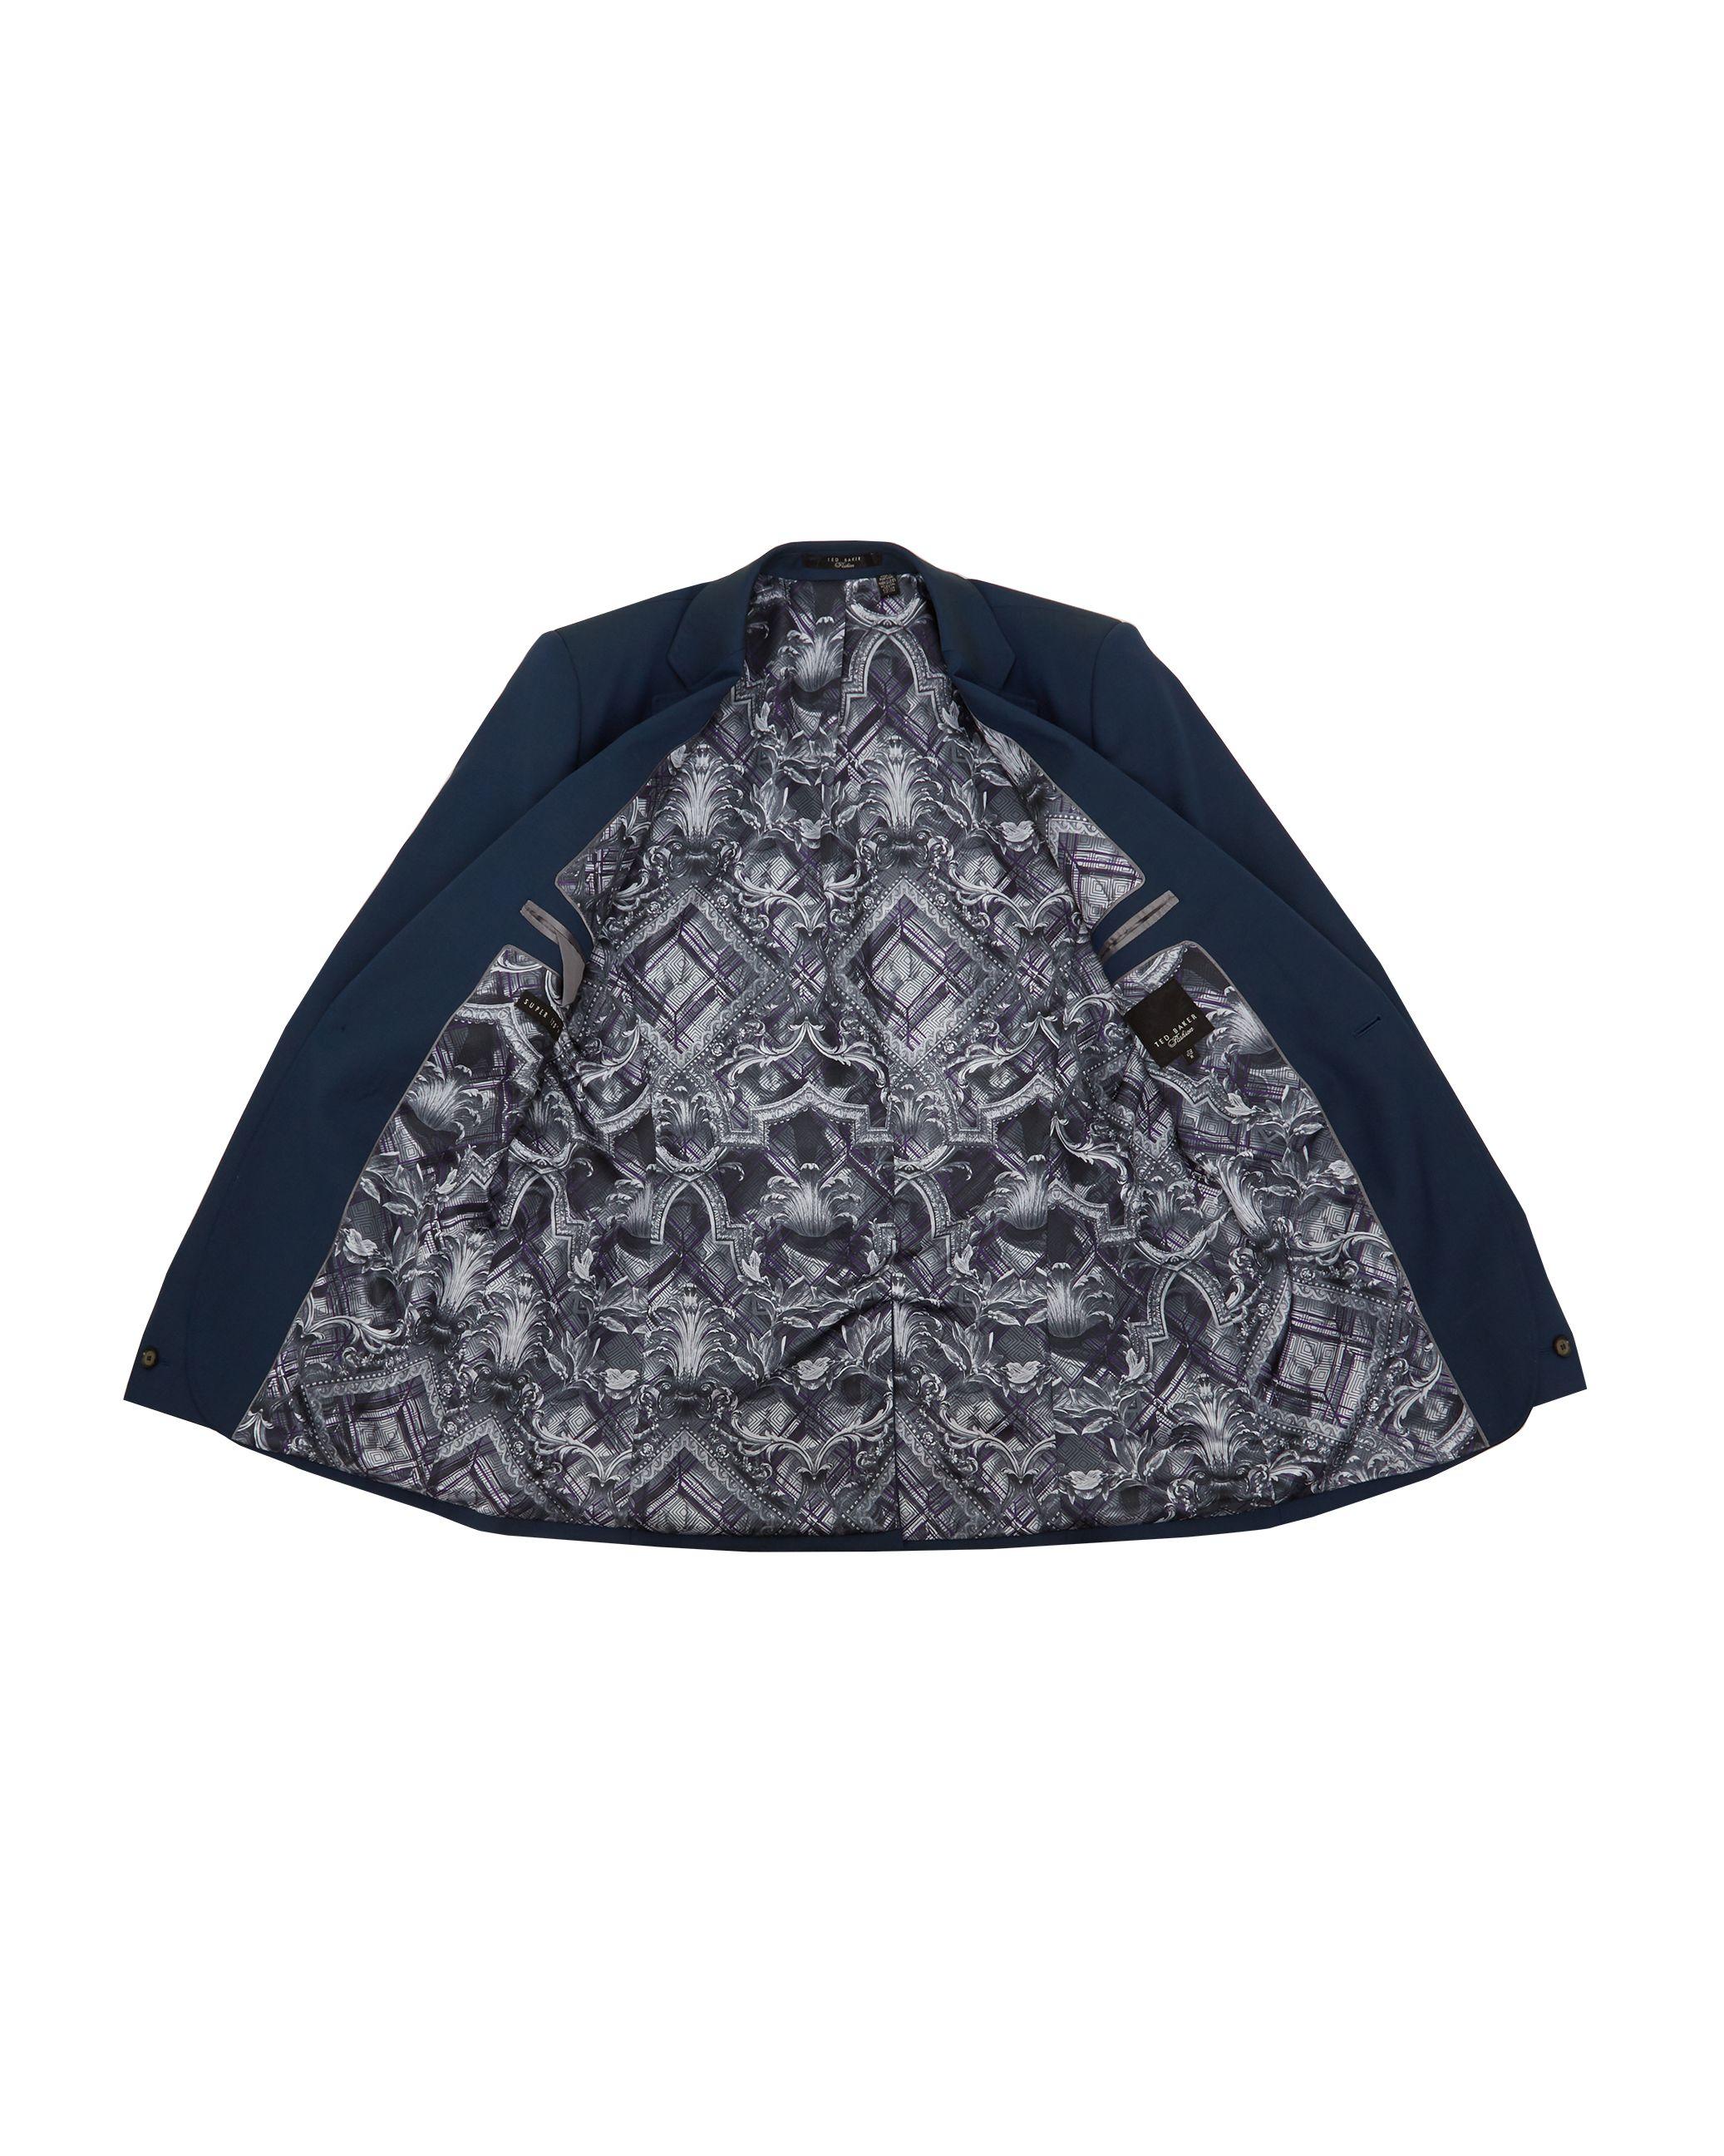 Ted Baker Sylvaj Pashion Plain Suit Jacket, Dark Blue